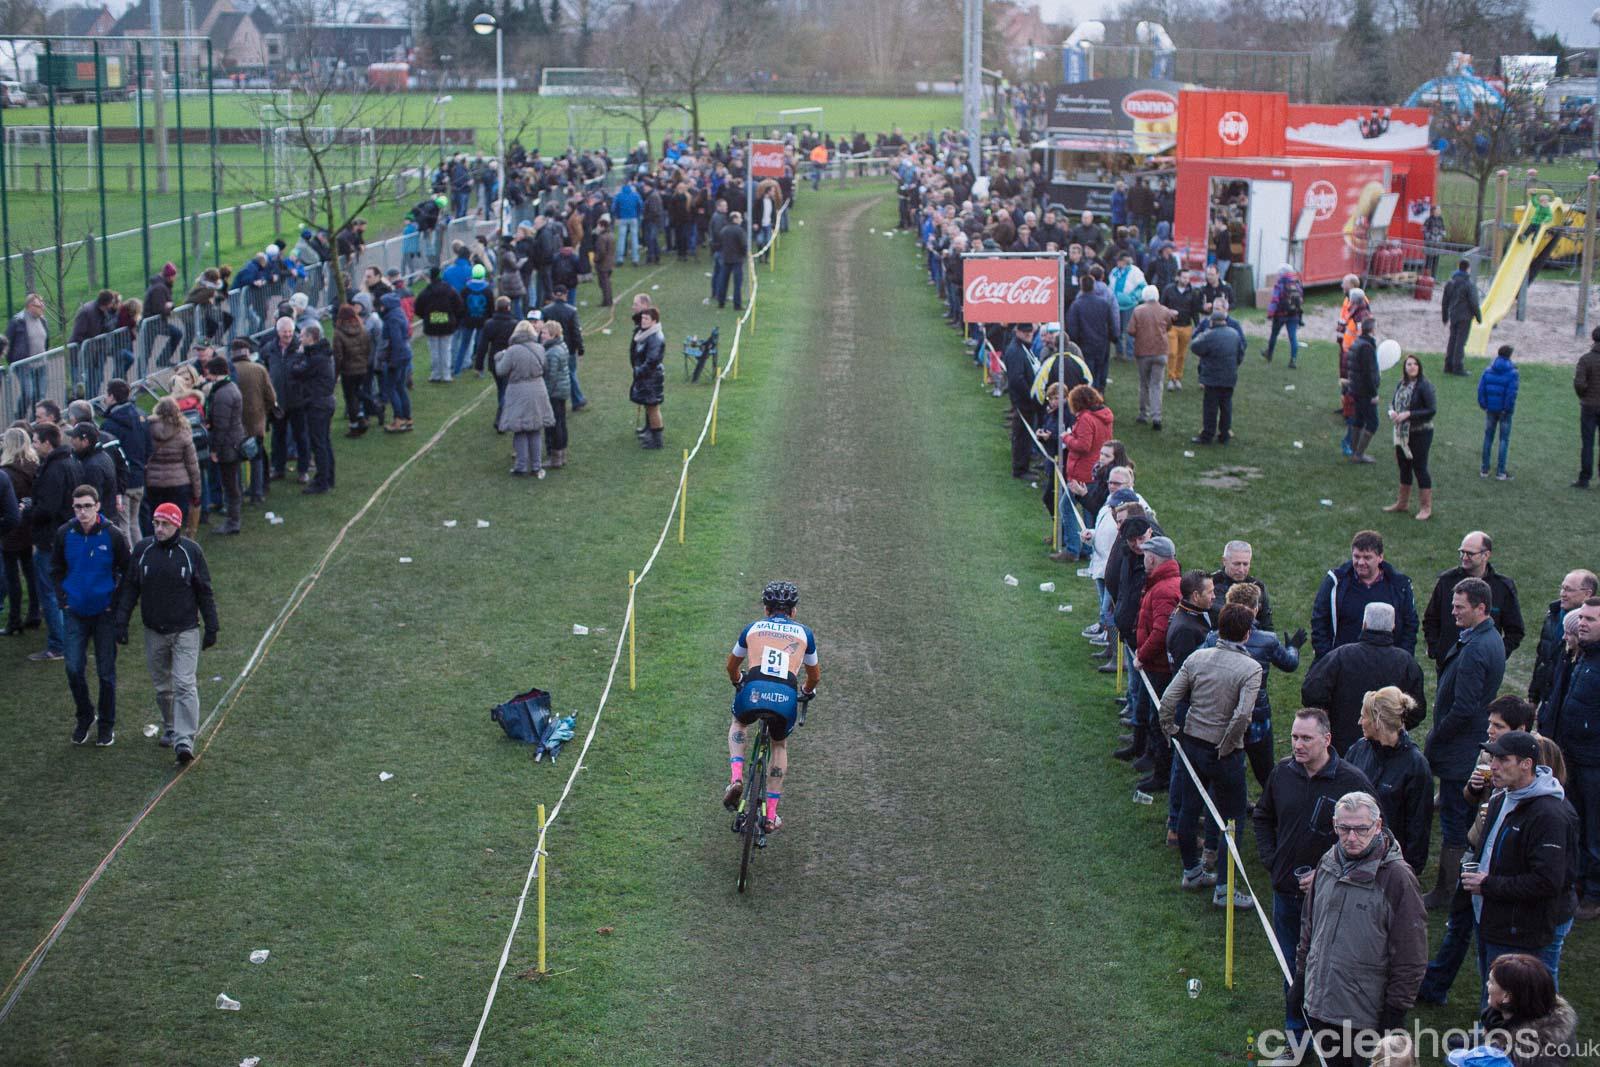 2015-cyclephotos-cyclocross-azencross-152823-angus-edmond